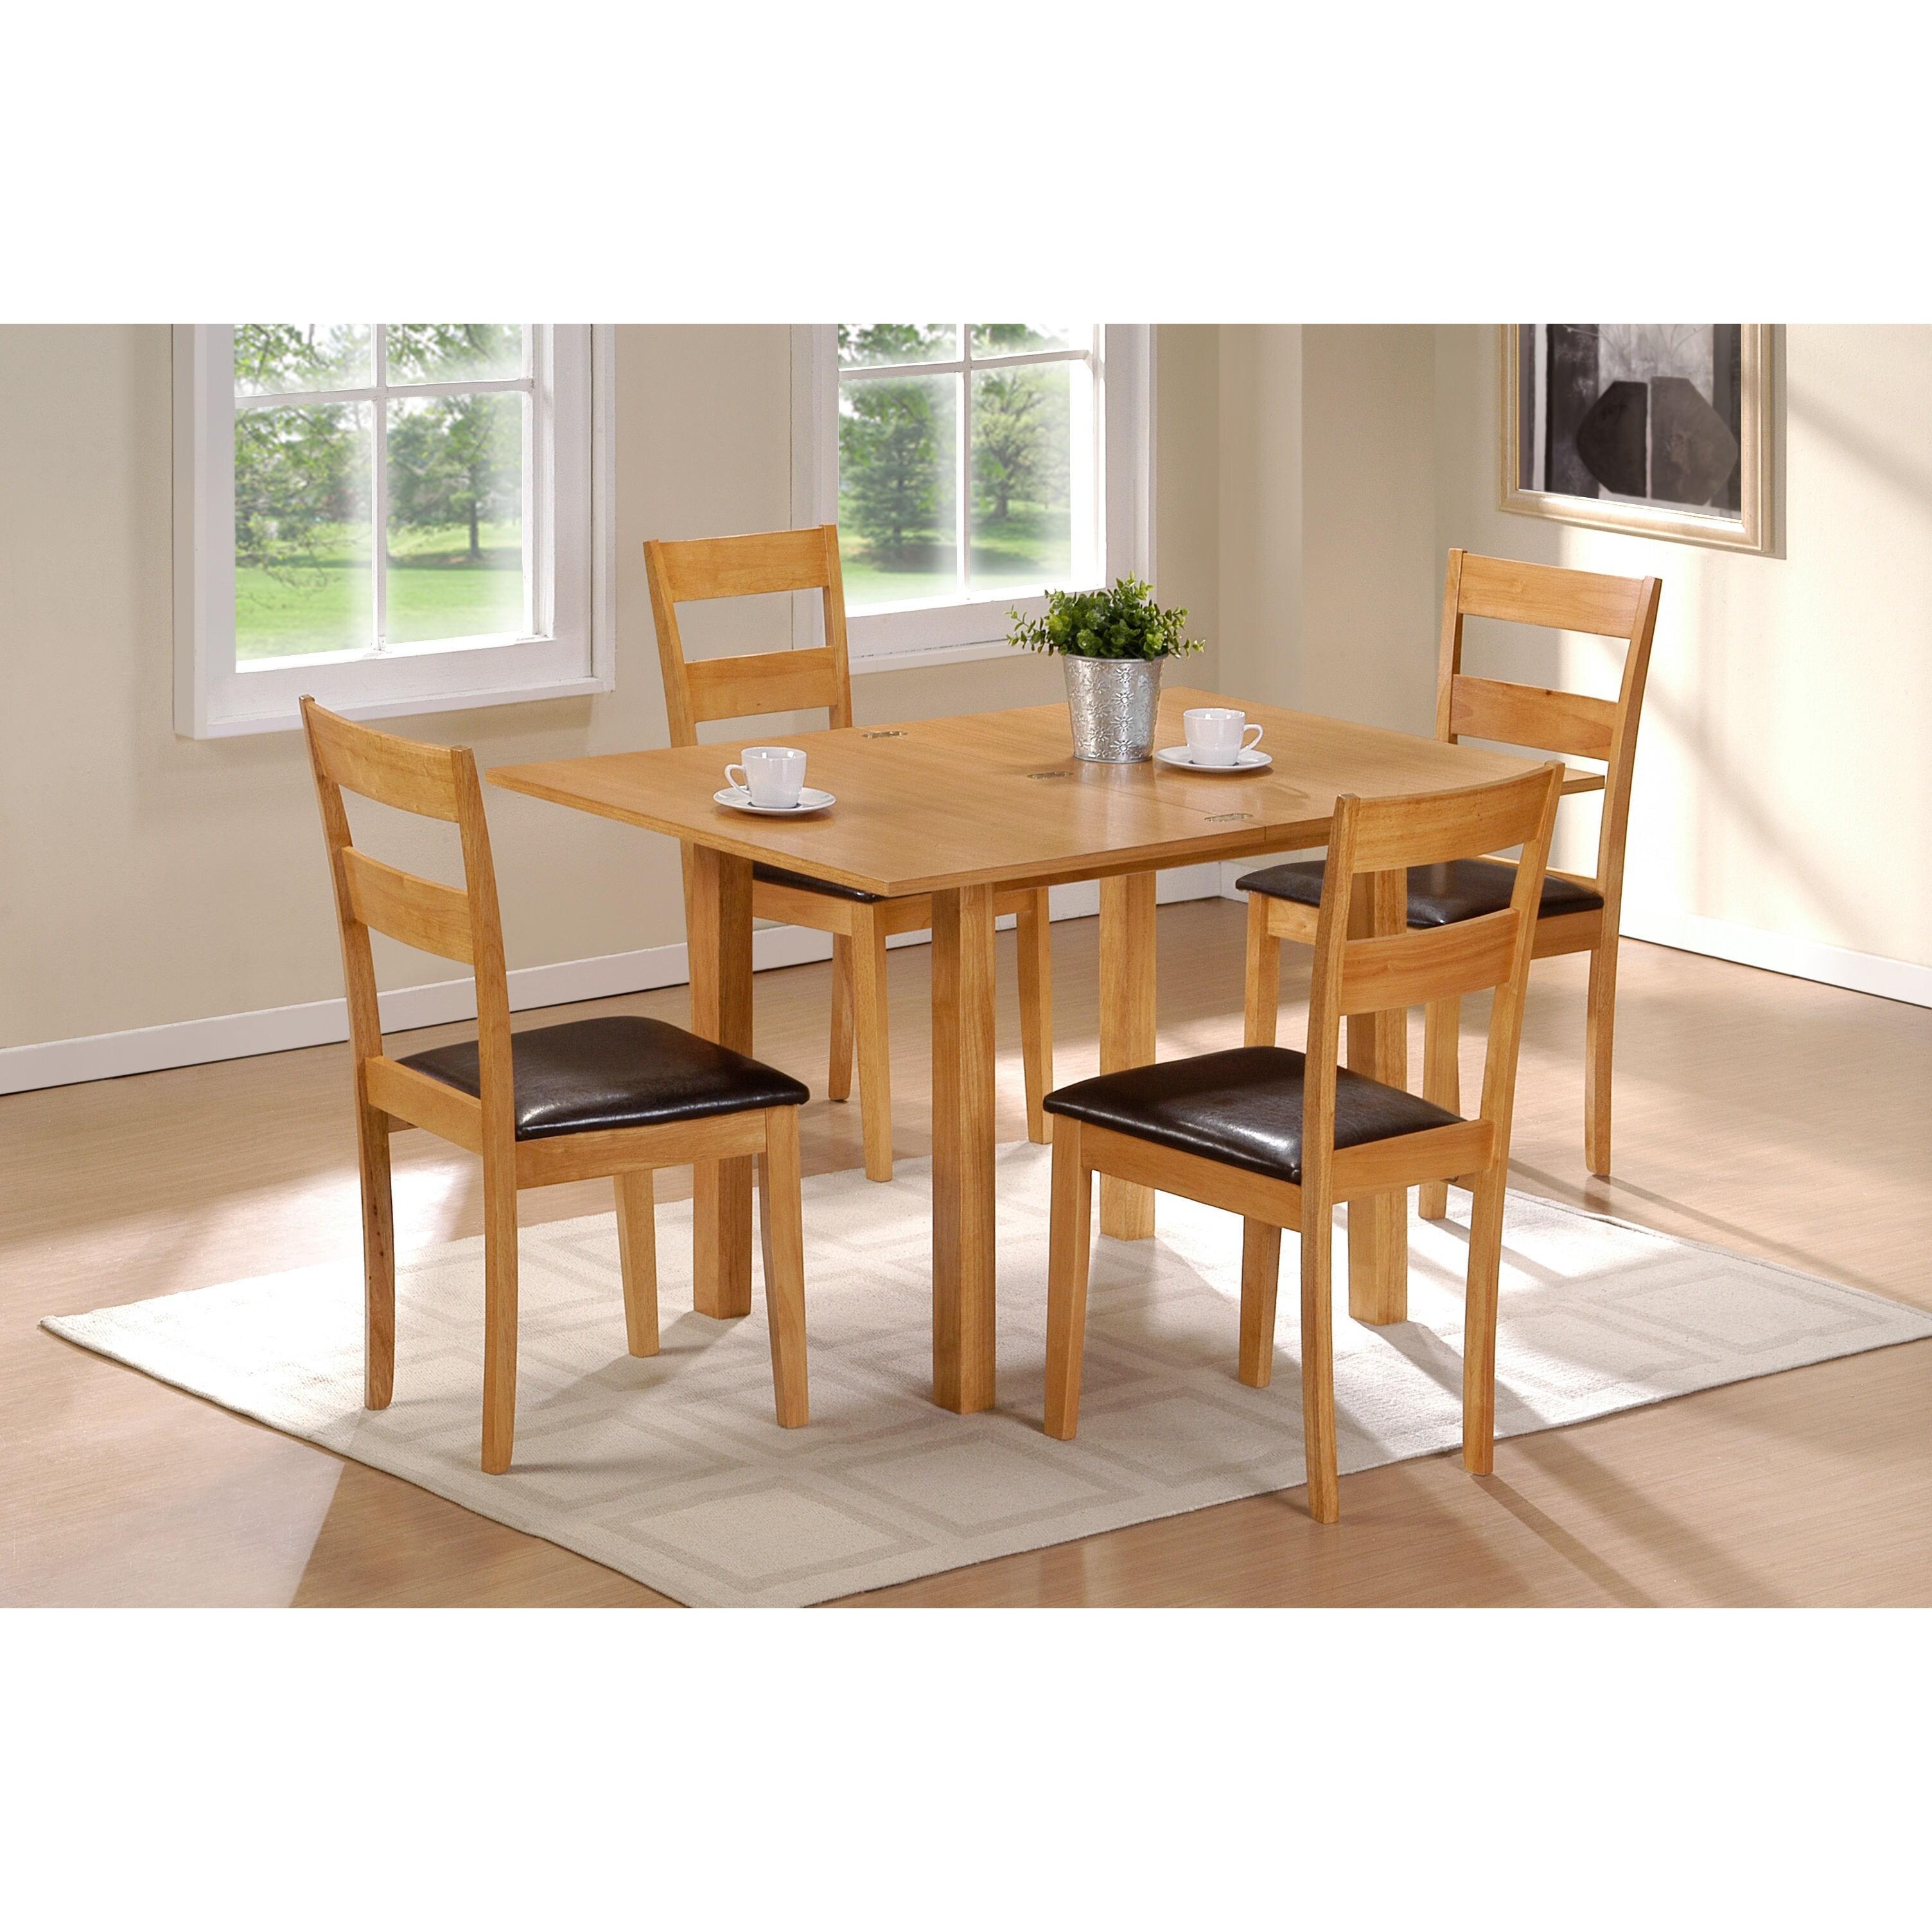 Scandinavian Lifestyle Colorado 5-piece Dining Set with F...